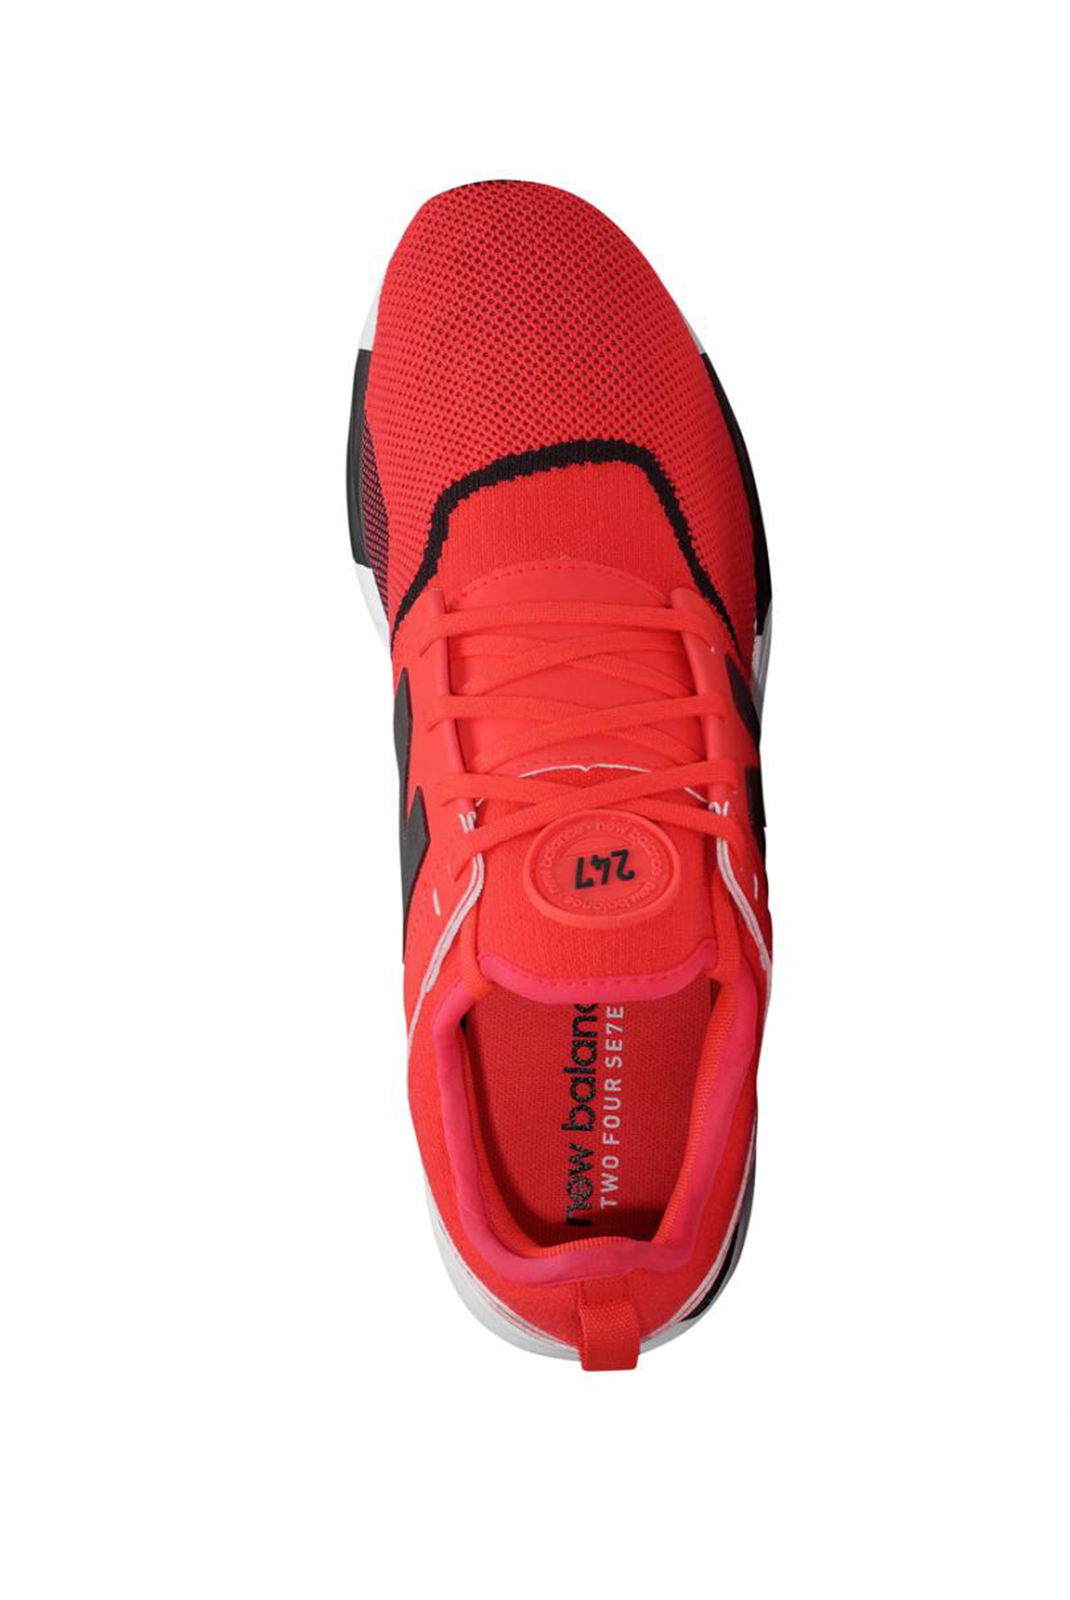 Chaussures   New balance MRL247LI ROUGE